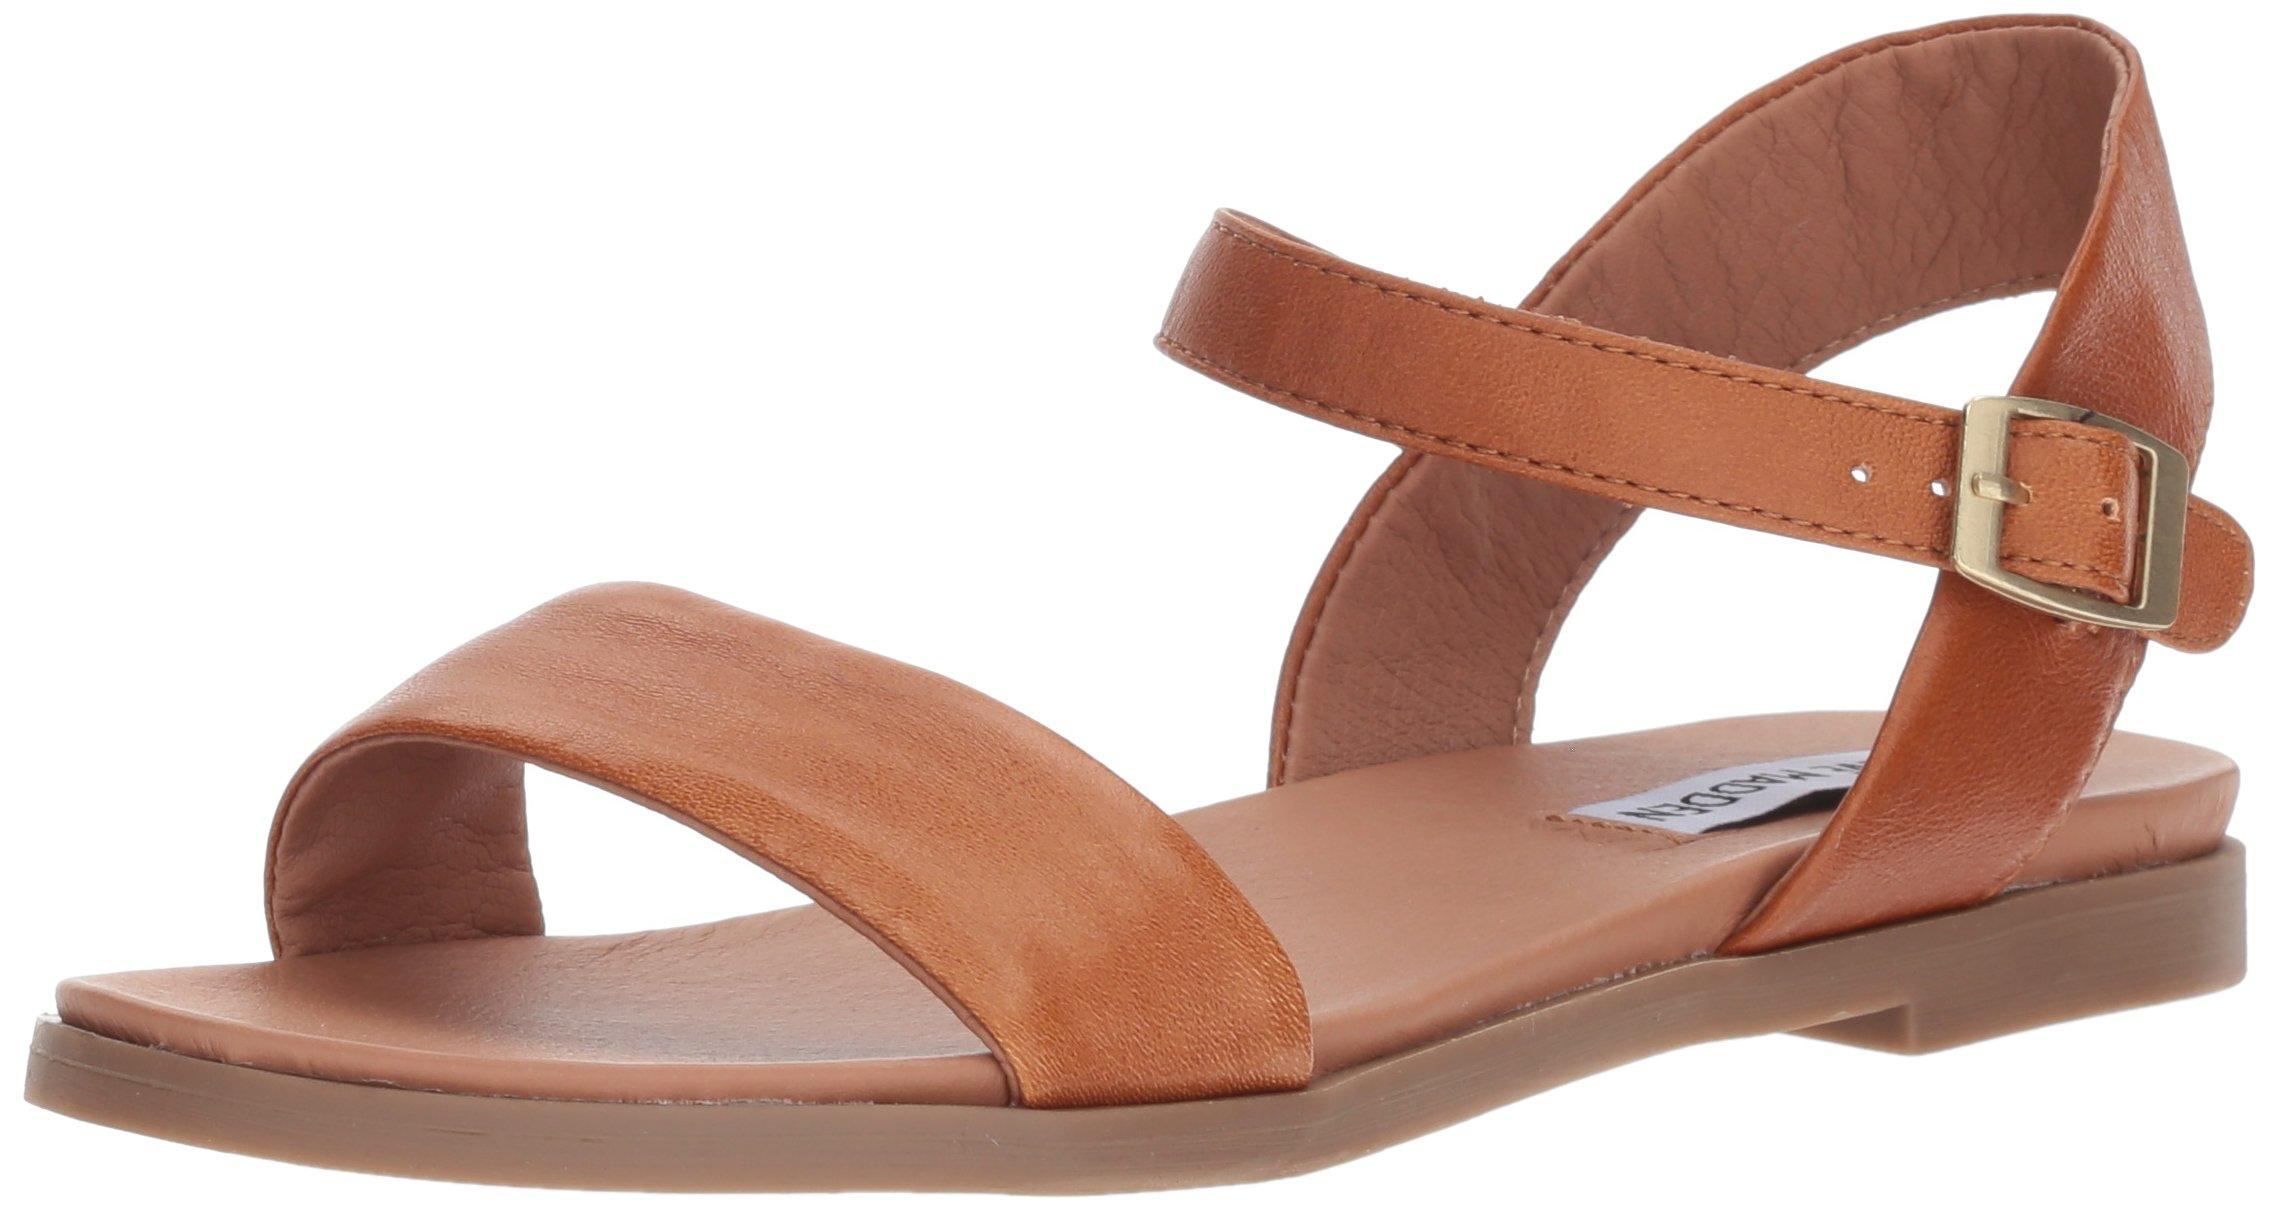 Steve Madden Women's DINA Flat Sandal, tan Leather, 8 M US by Steve Madden